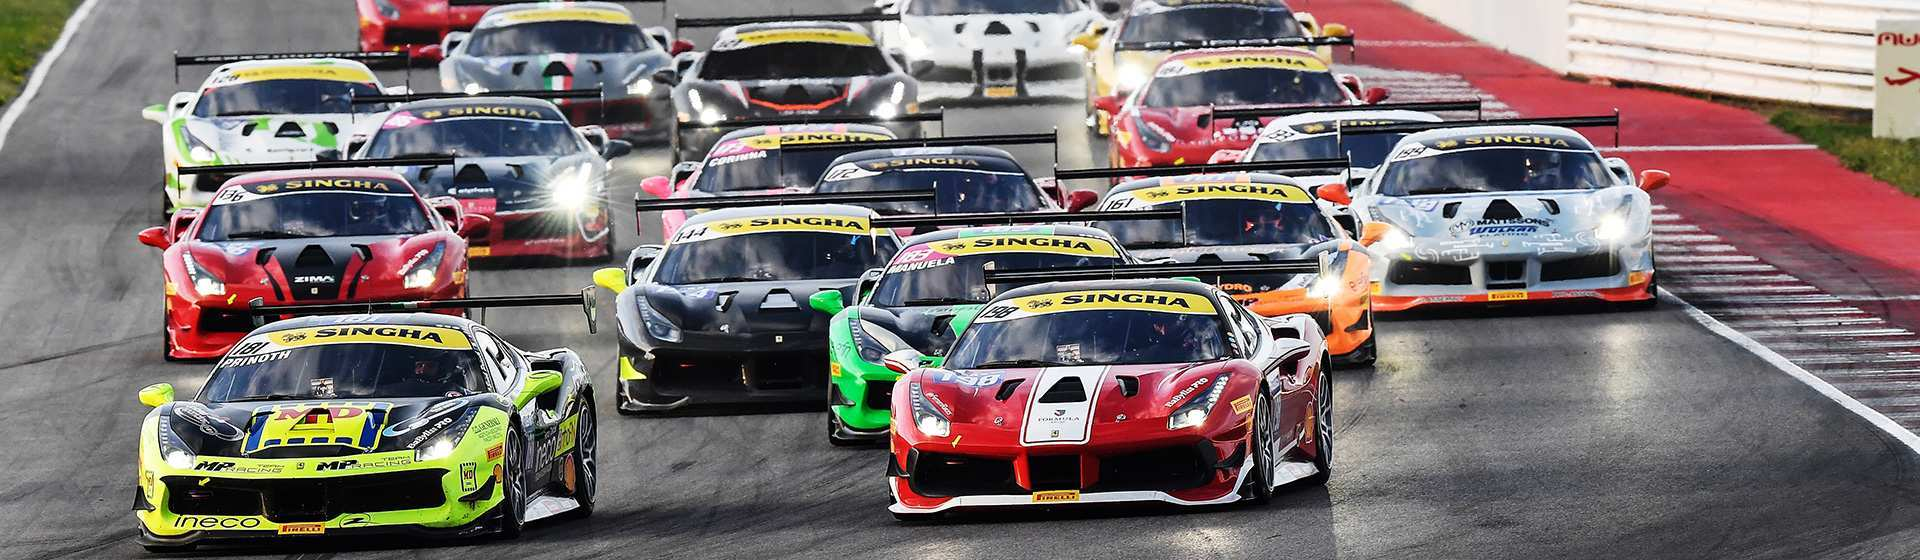 27 Great New Ferrari Challenge 2019 Calendar Price Overview by New Ferrari Challenge 2019 Calendar Price